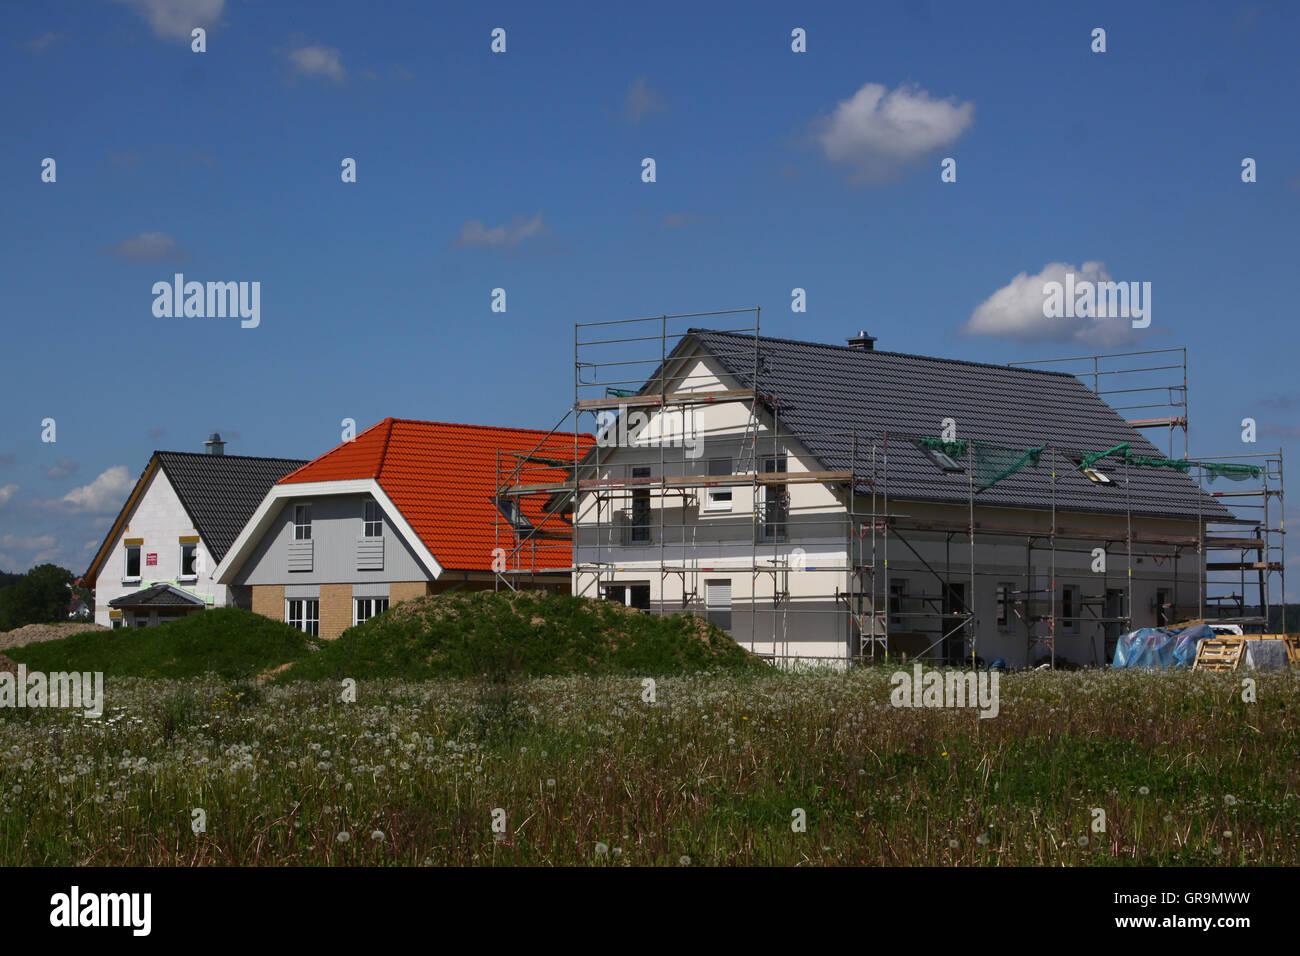 Familiy Houses - Stock Image